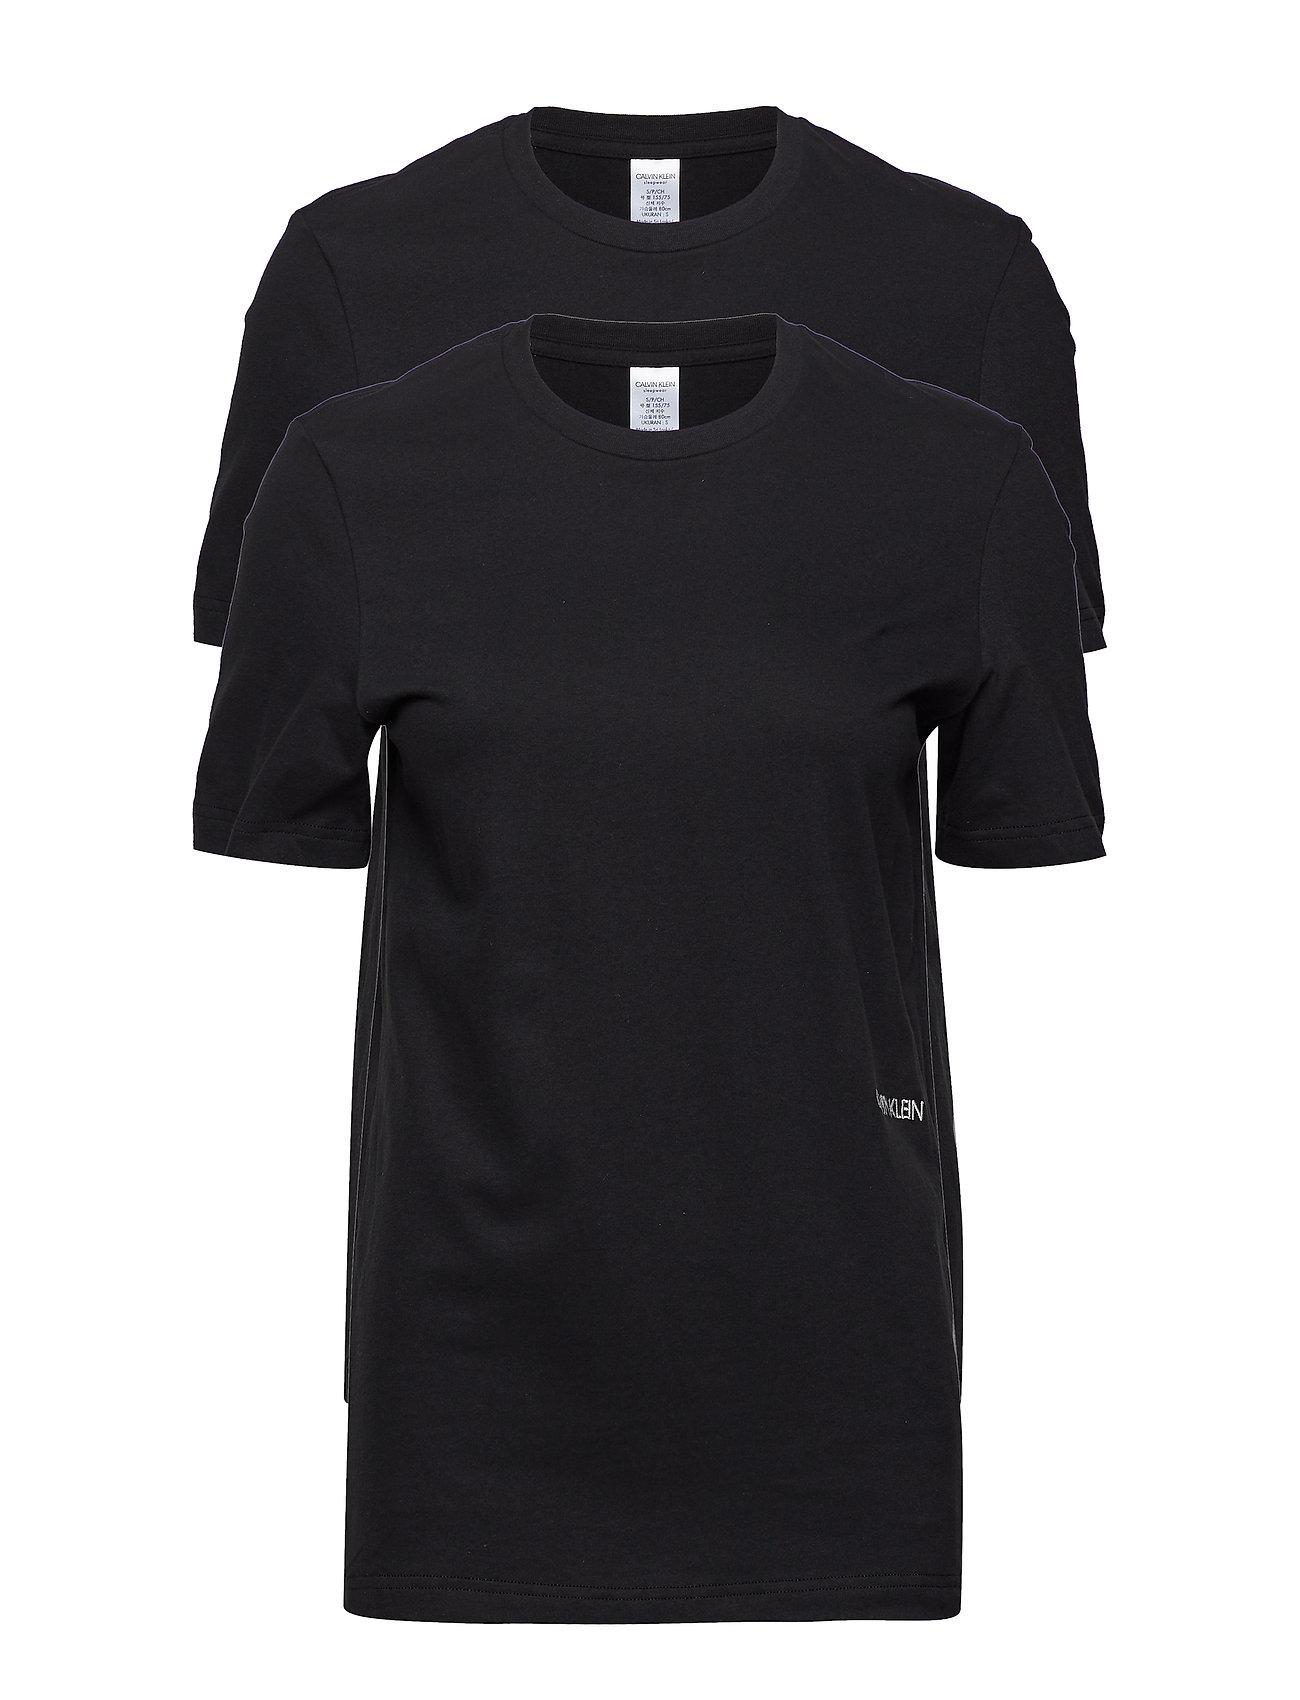 Calvin Klein S/S CREW NECK 2PK, 0 - BLACK